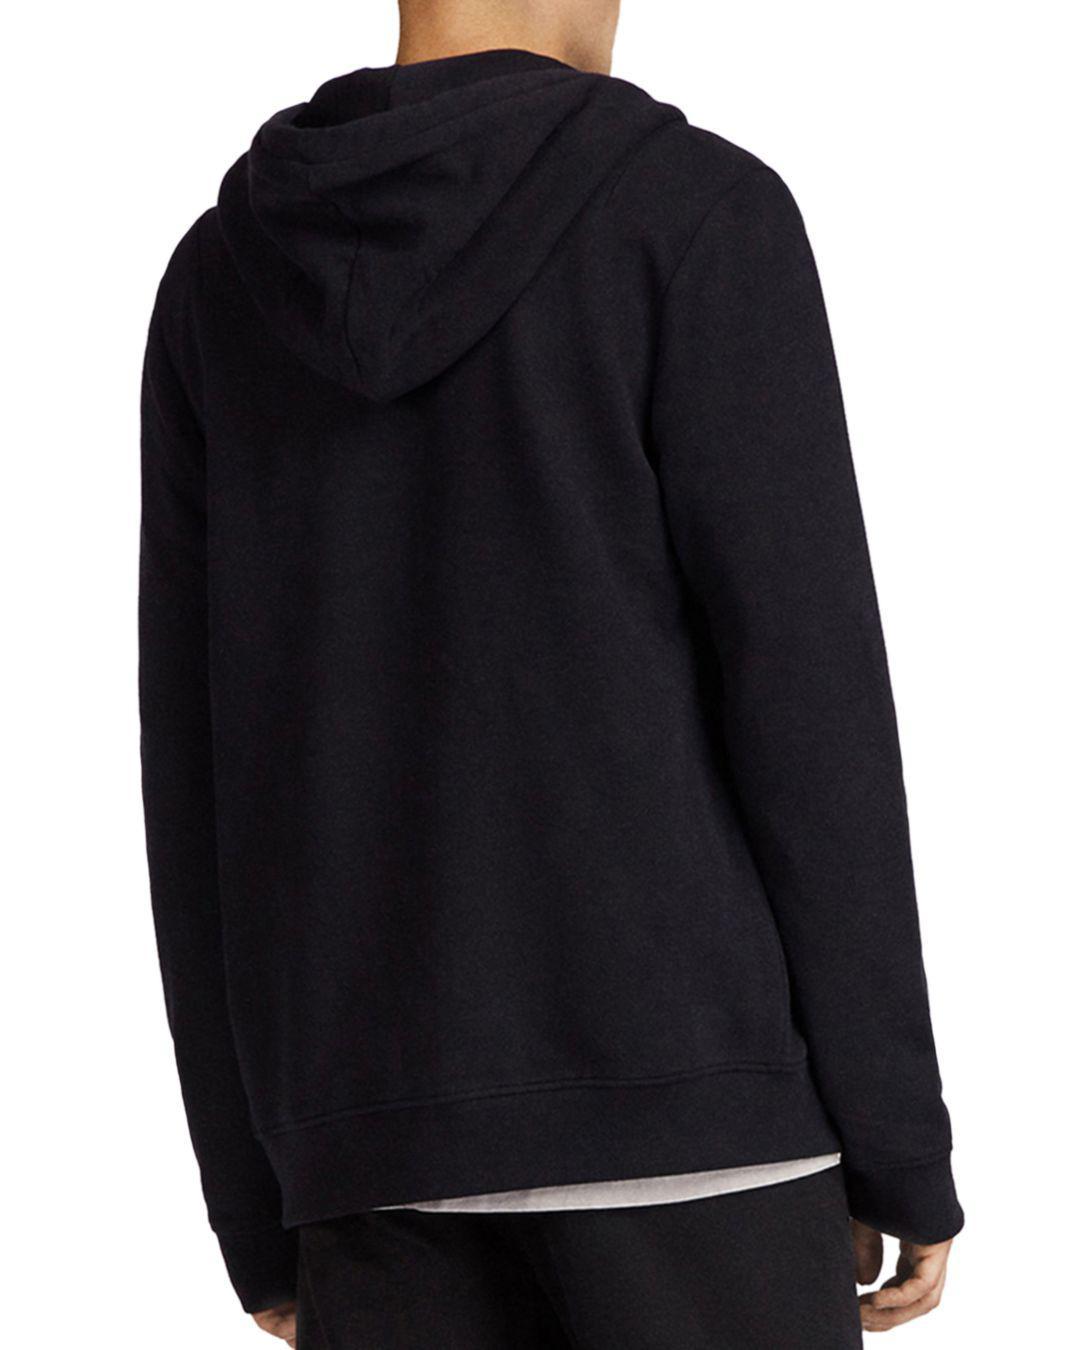 AllSaints Raven Hoodie in Black for Men